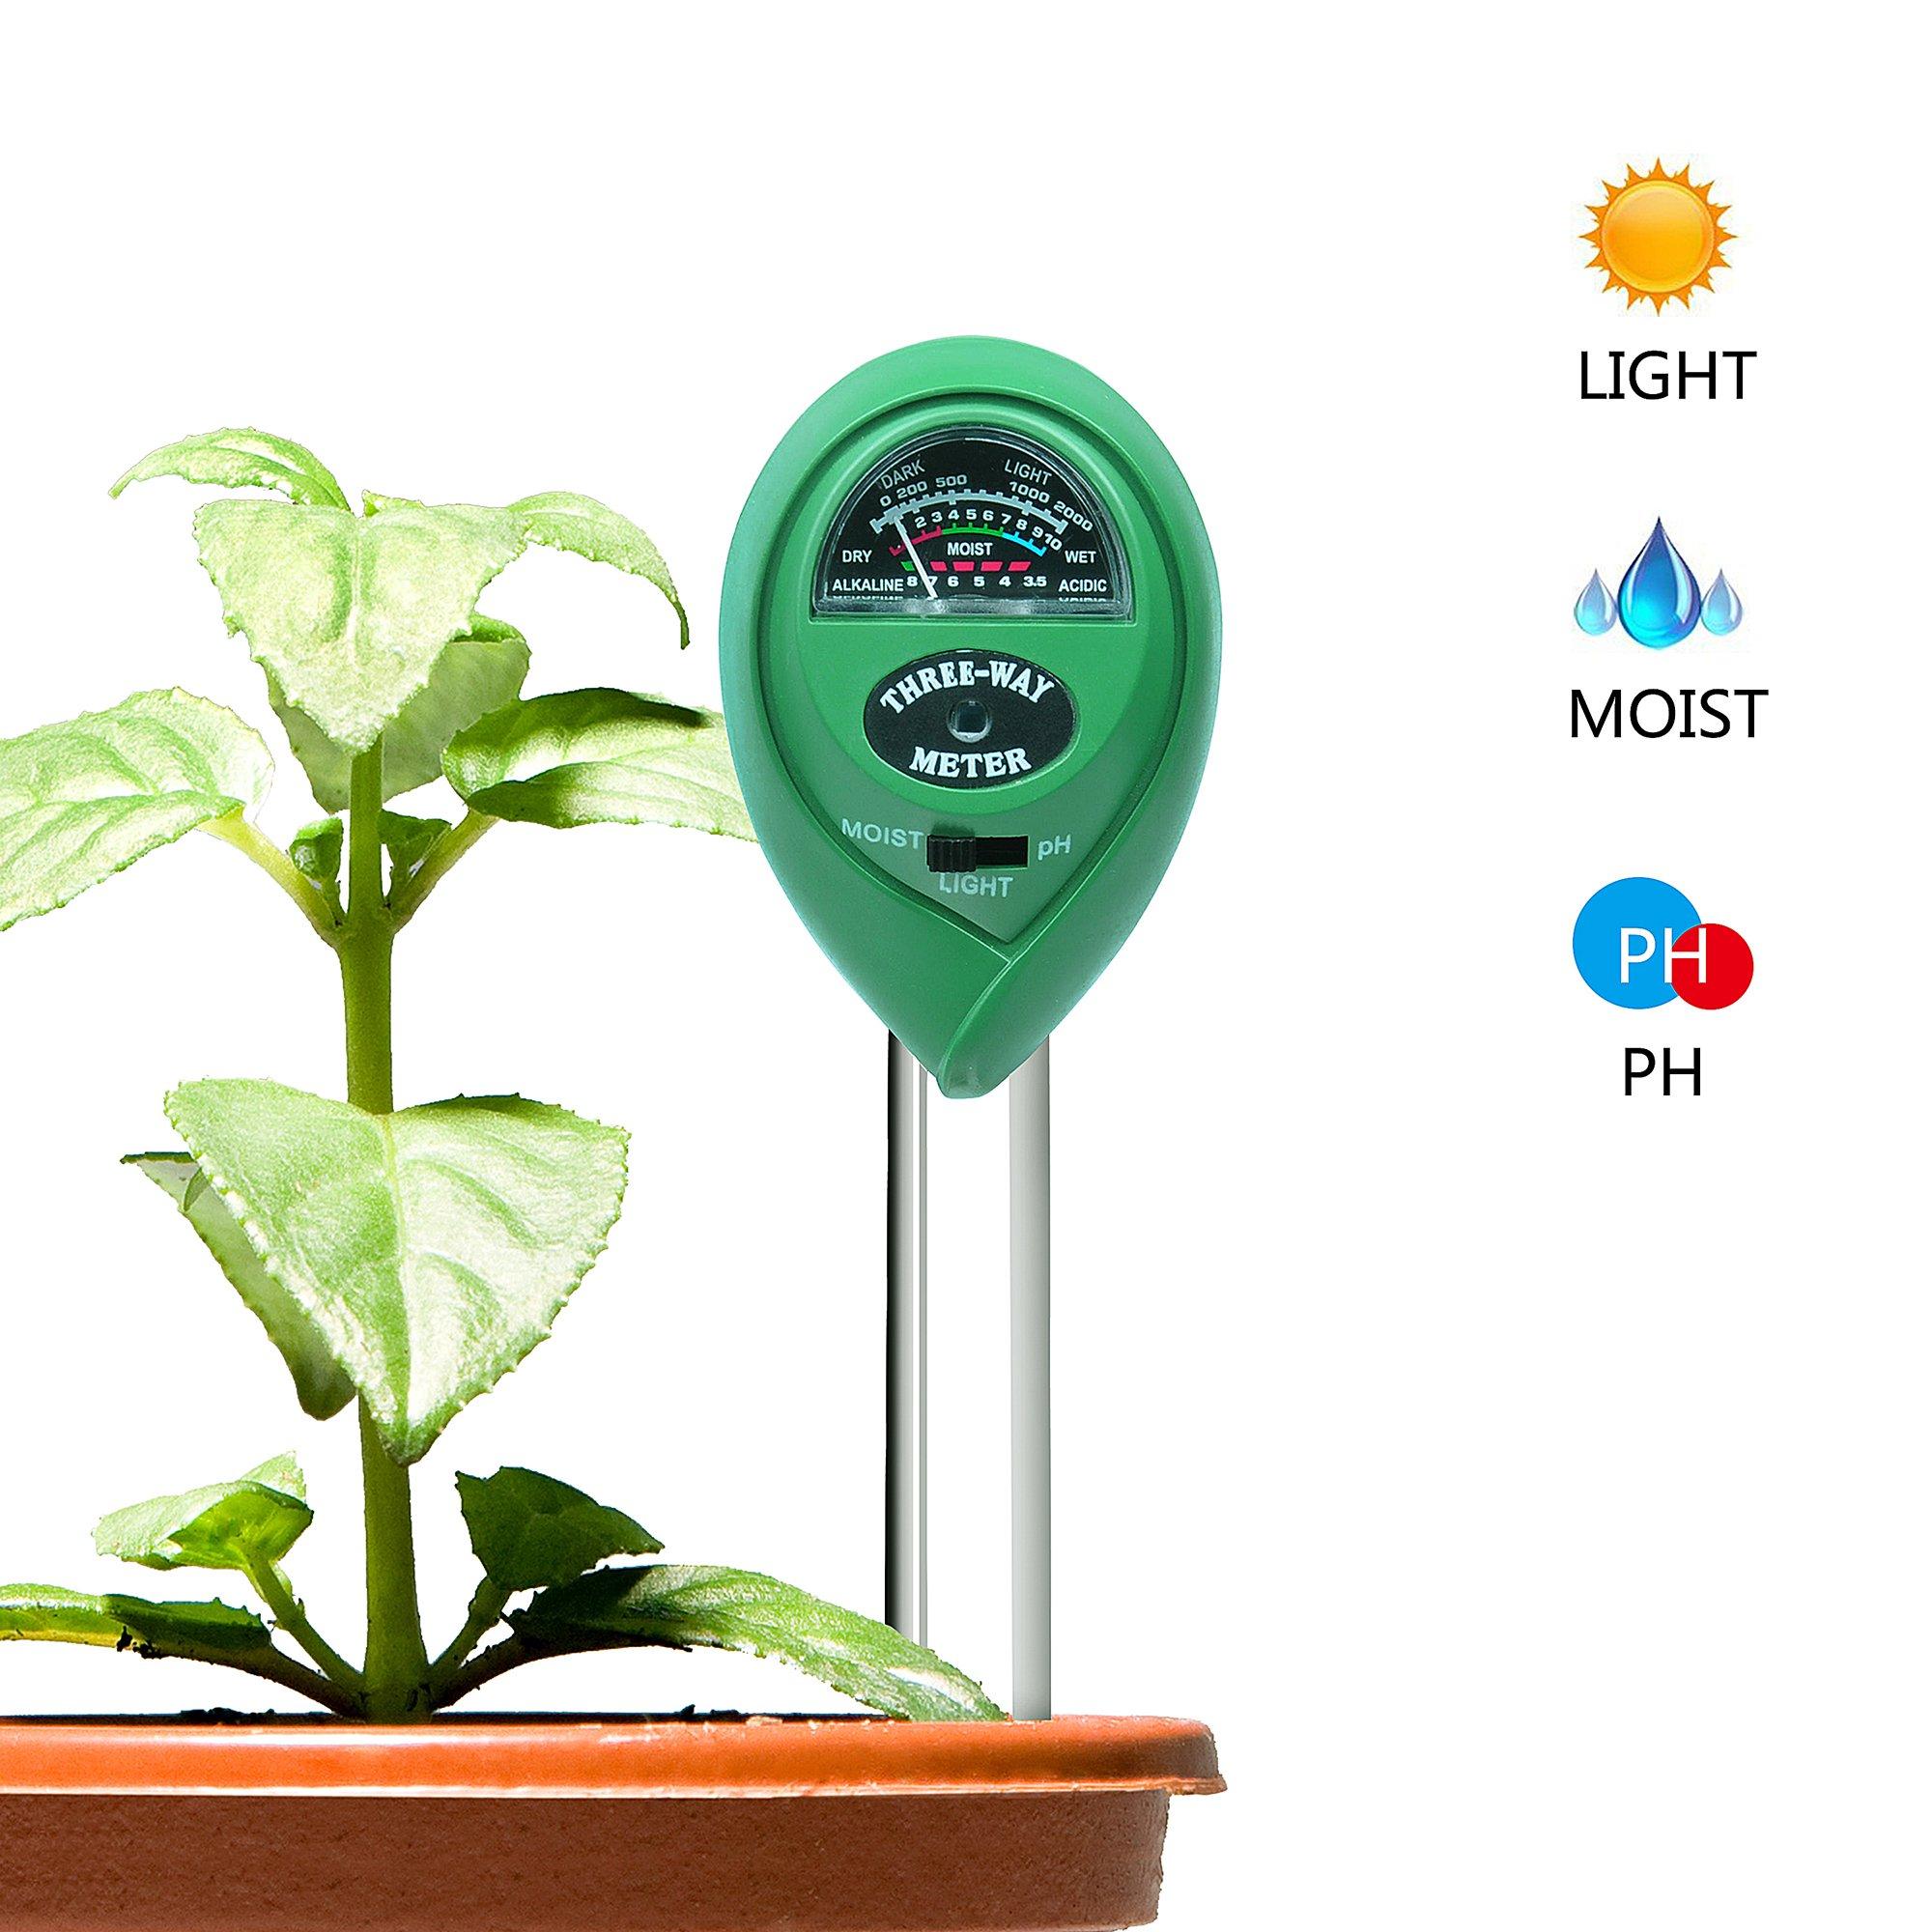 Locus Soil PH Meter, Light PH Tester, 3-in-1 Soil Moisture Meter, Soil Meter Indoor Outdoor Garden, Farm, Lawn, (No Battery Needed)